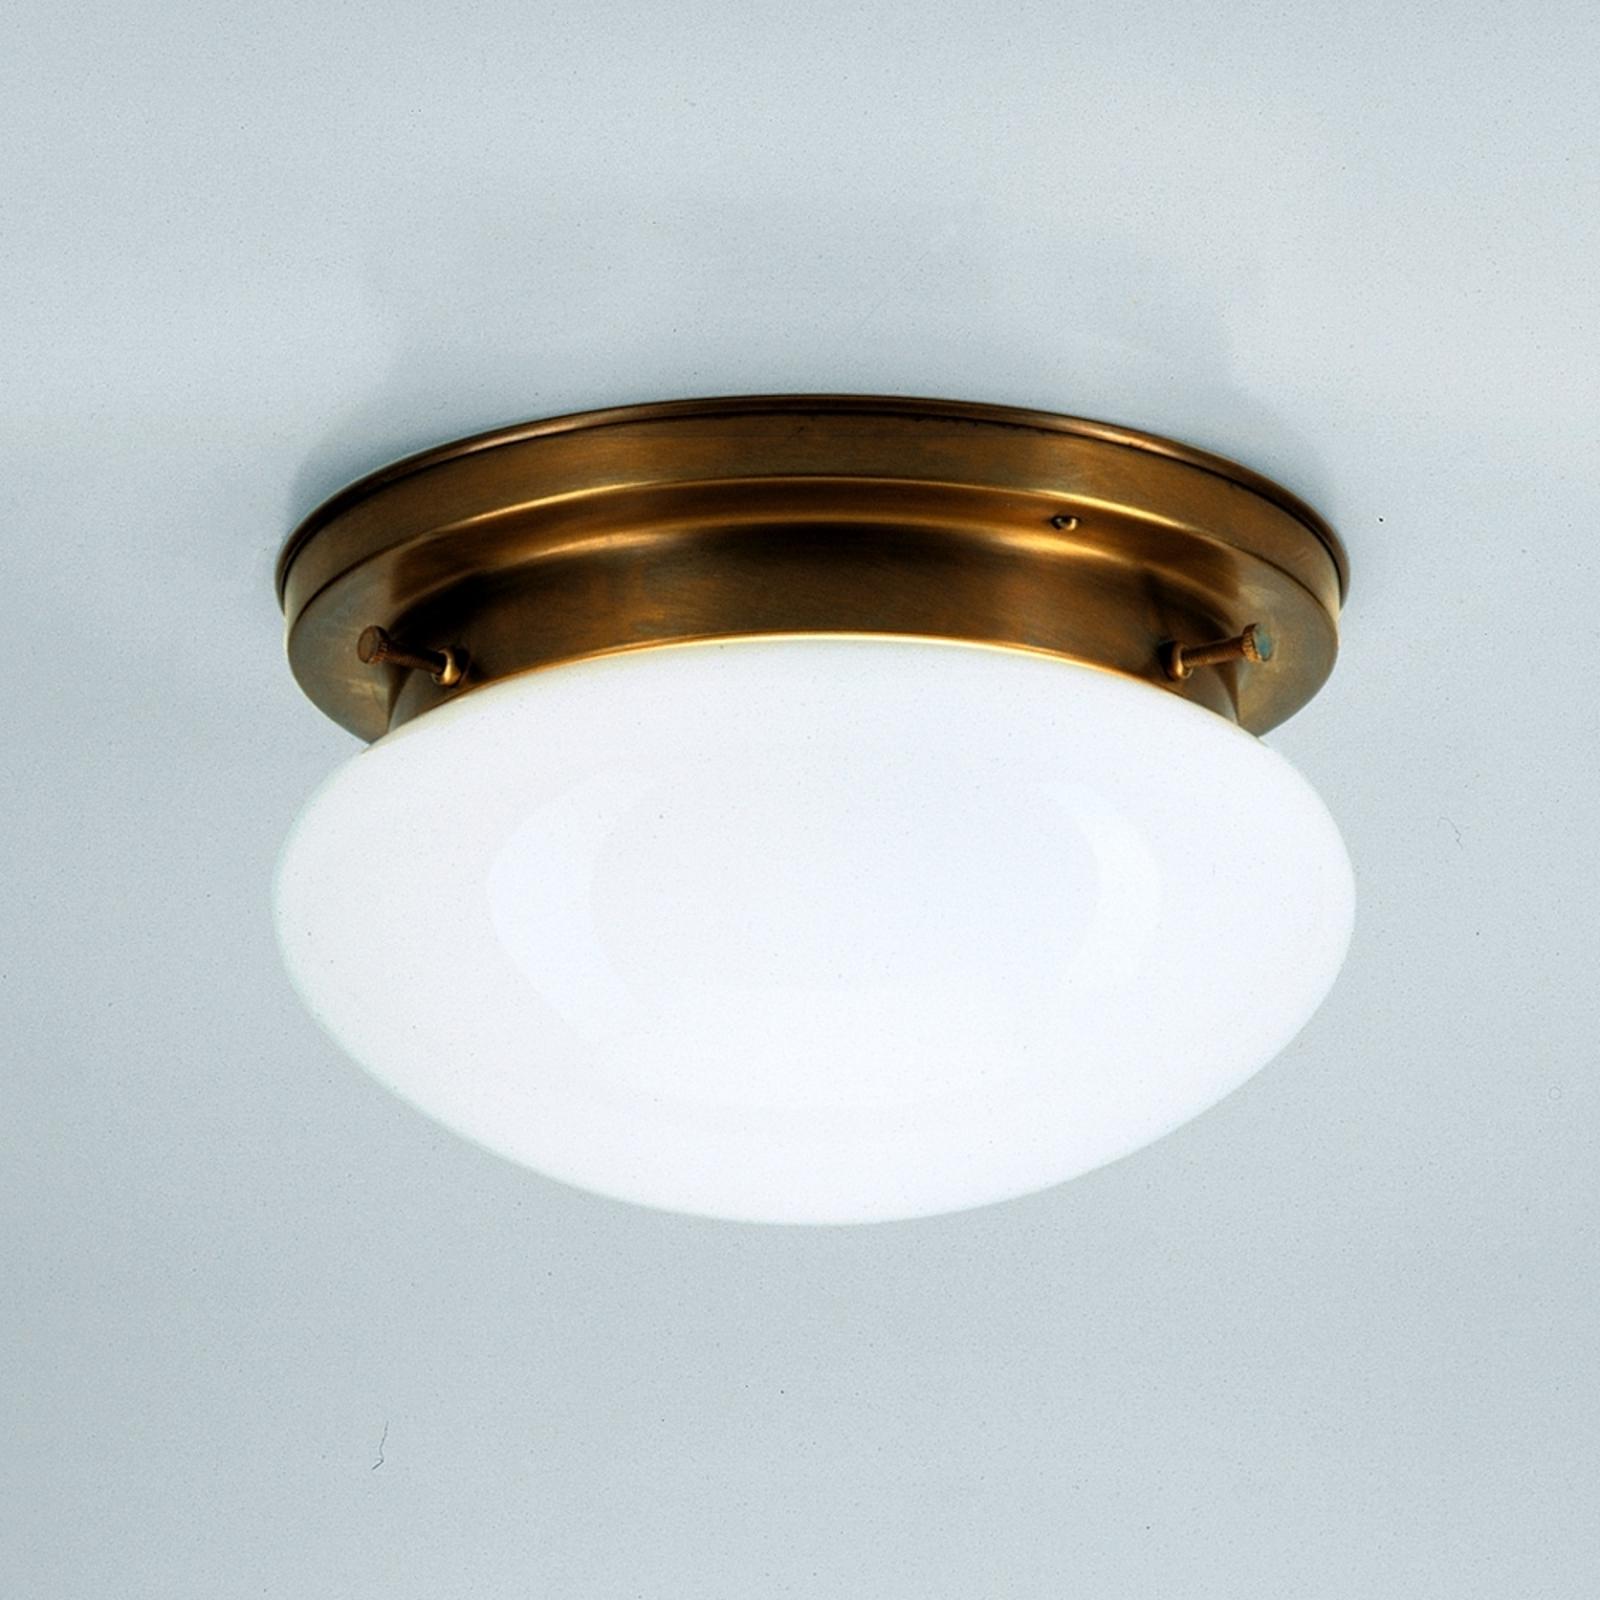 Lampada da soffitto opalina HARRY in ottone